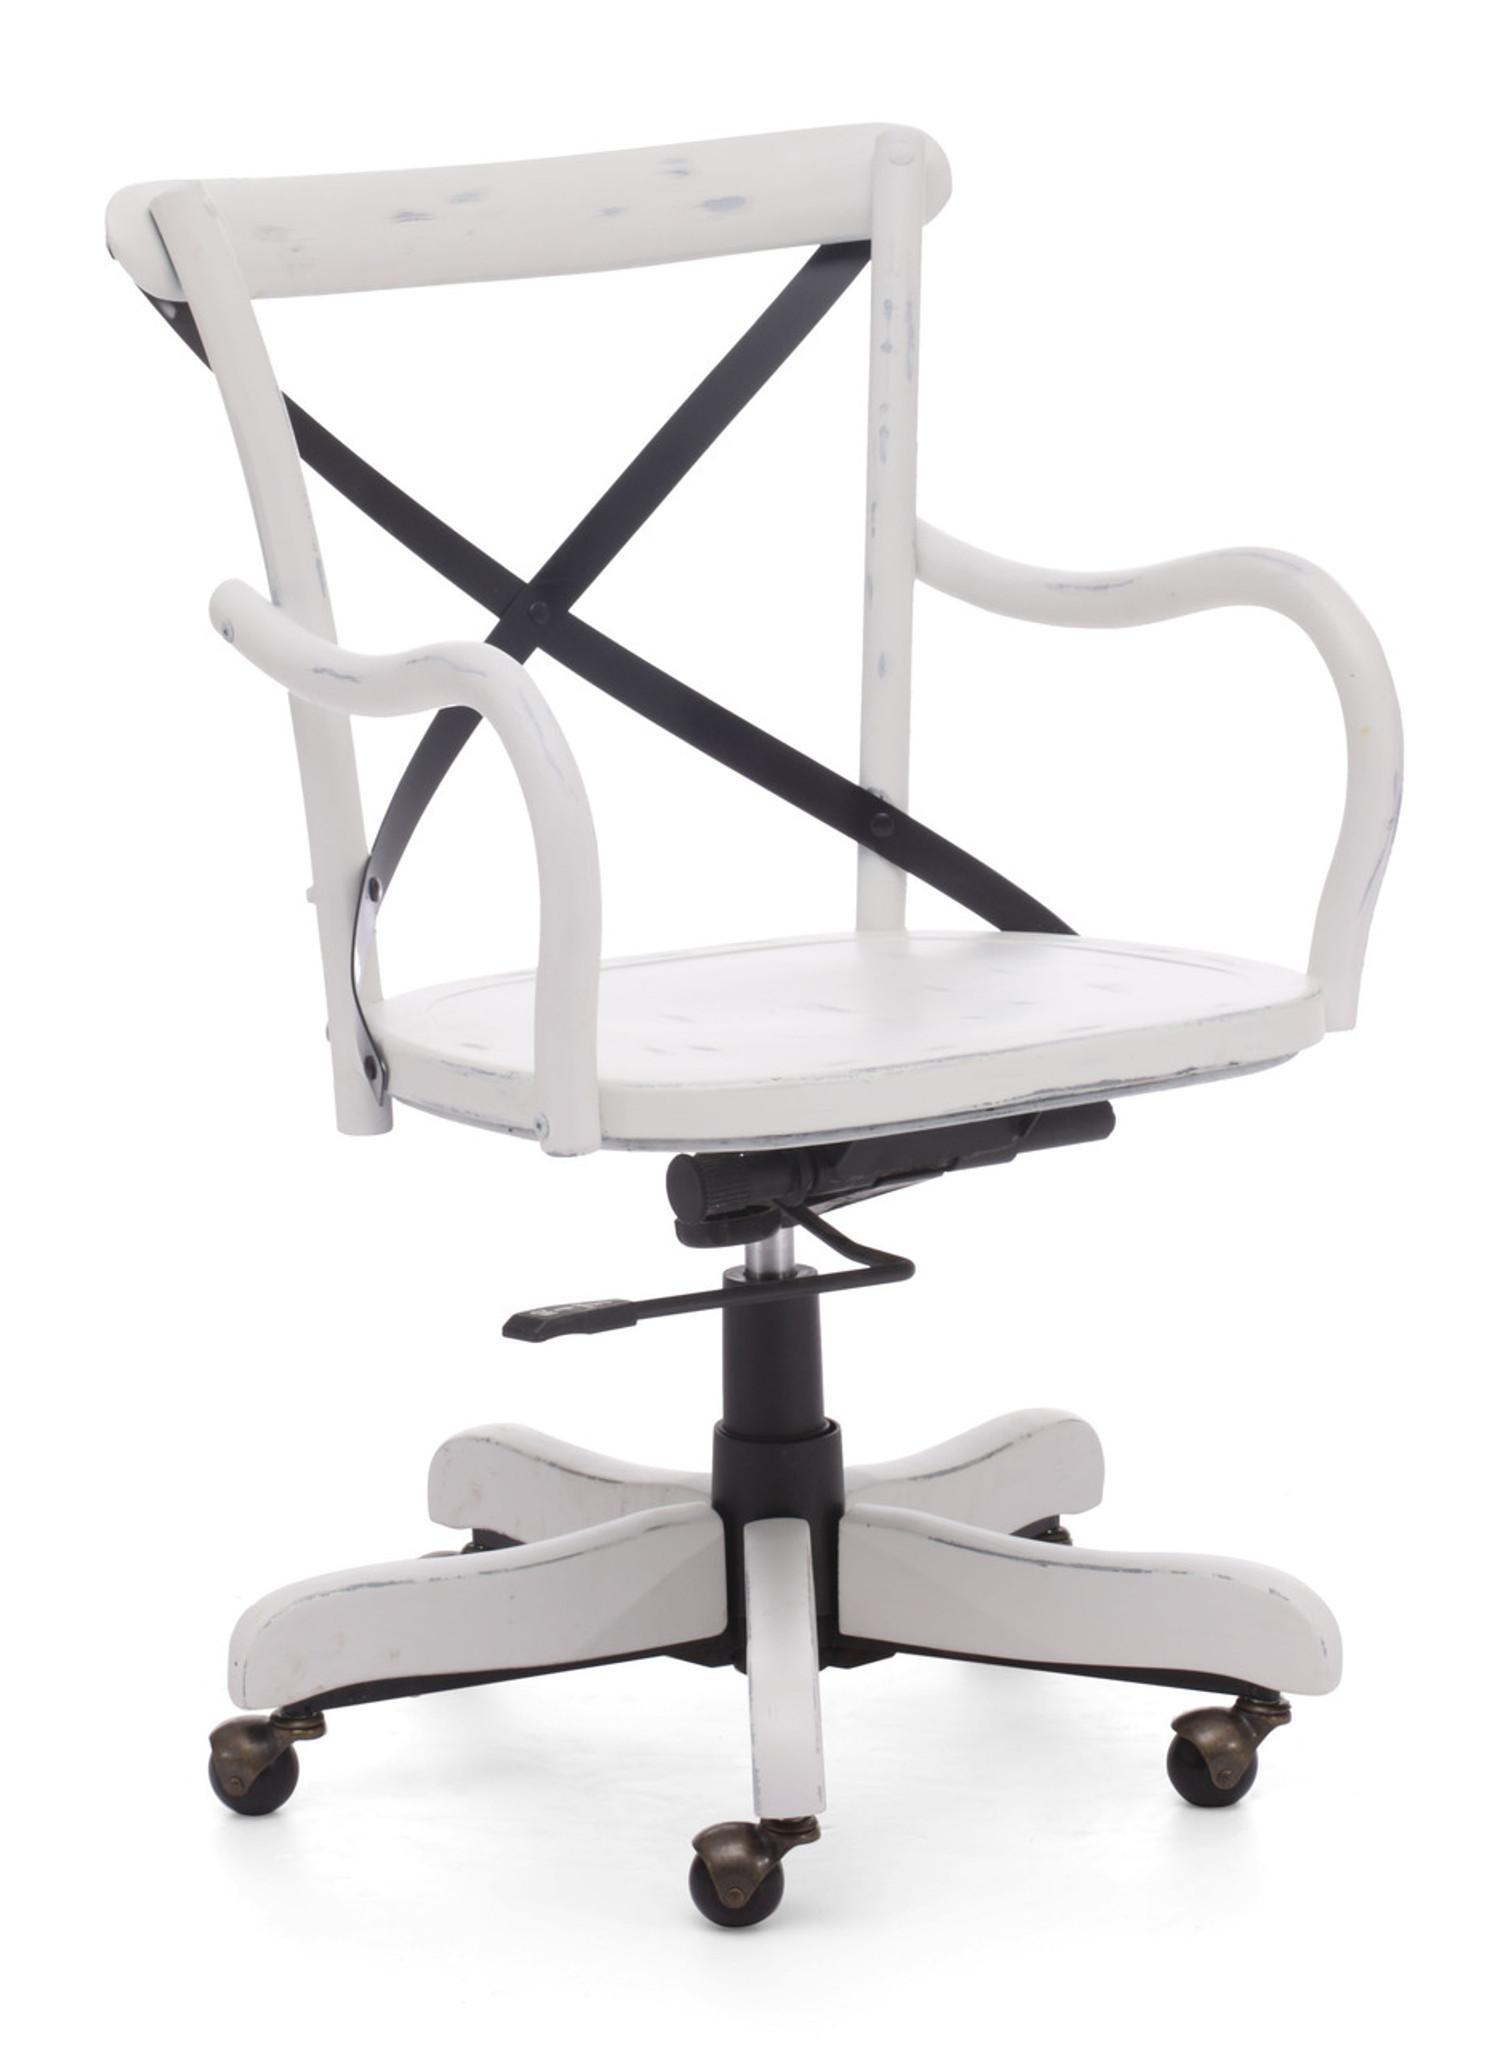 98032 Union Square Office Chair Antique White 816226022111 Seating Modern Antique  White Office Chair by Zuo - Union Square Office Chair Antique White